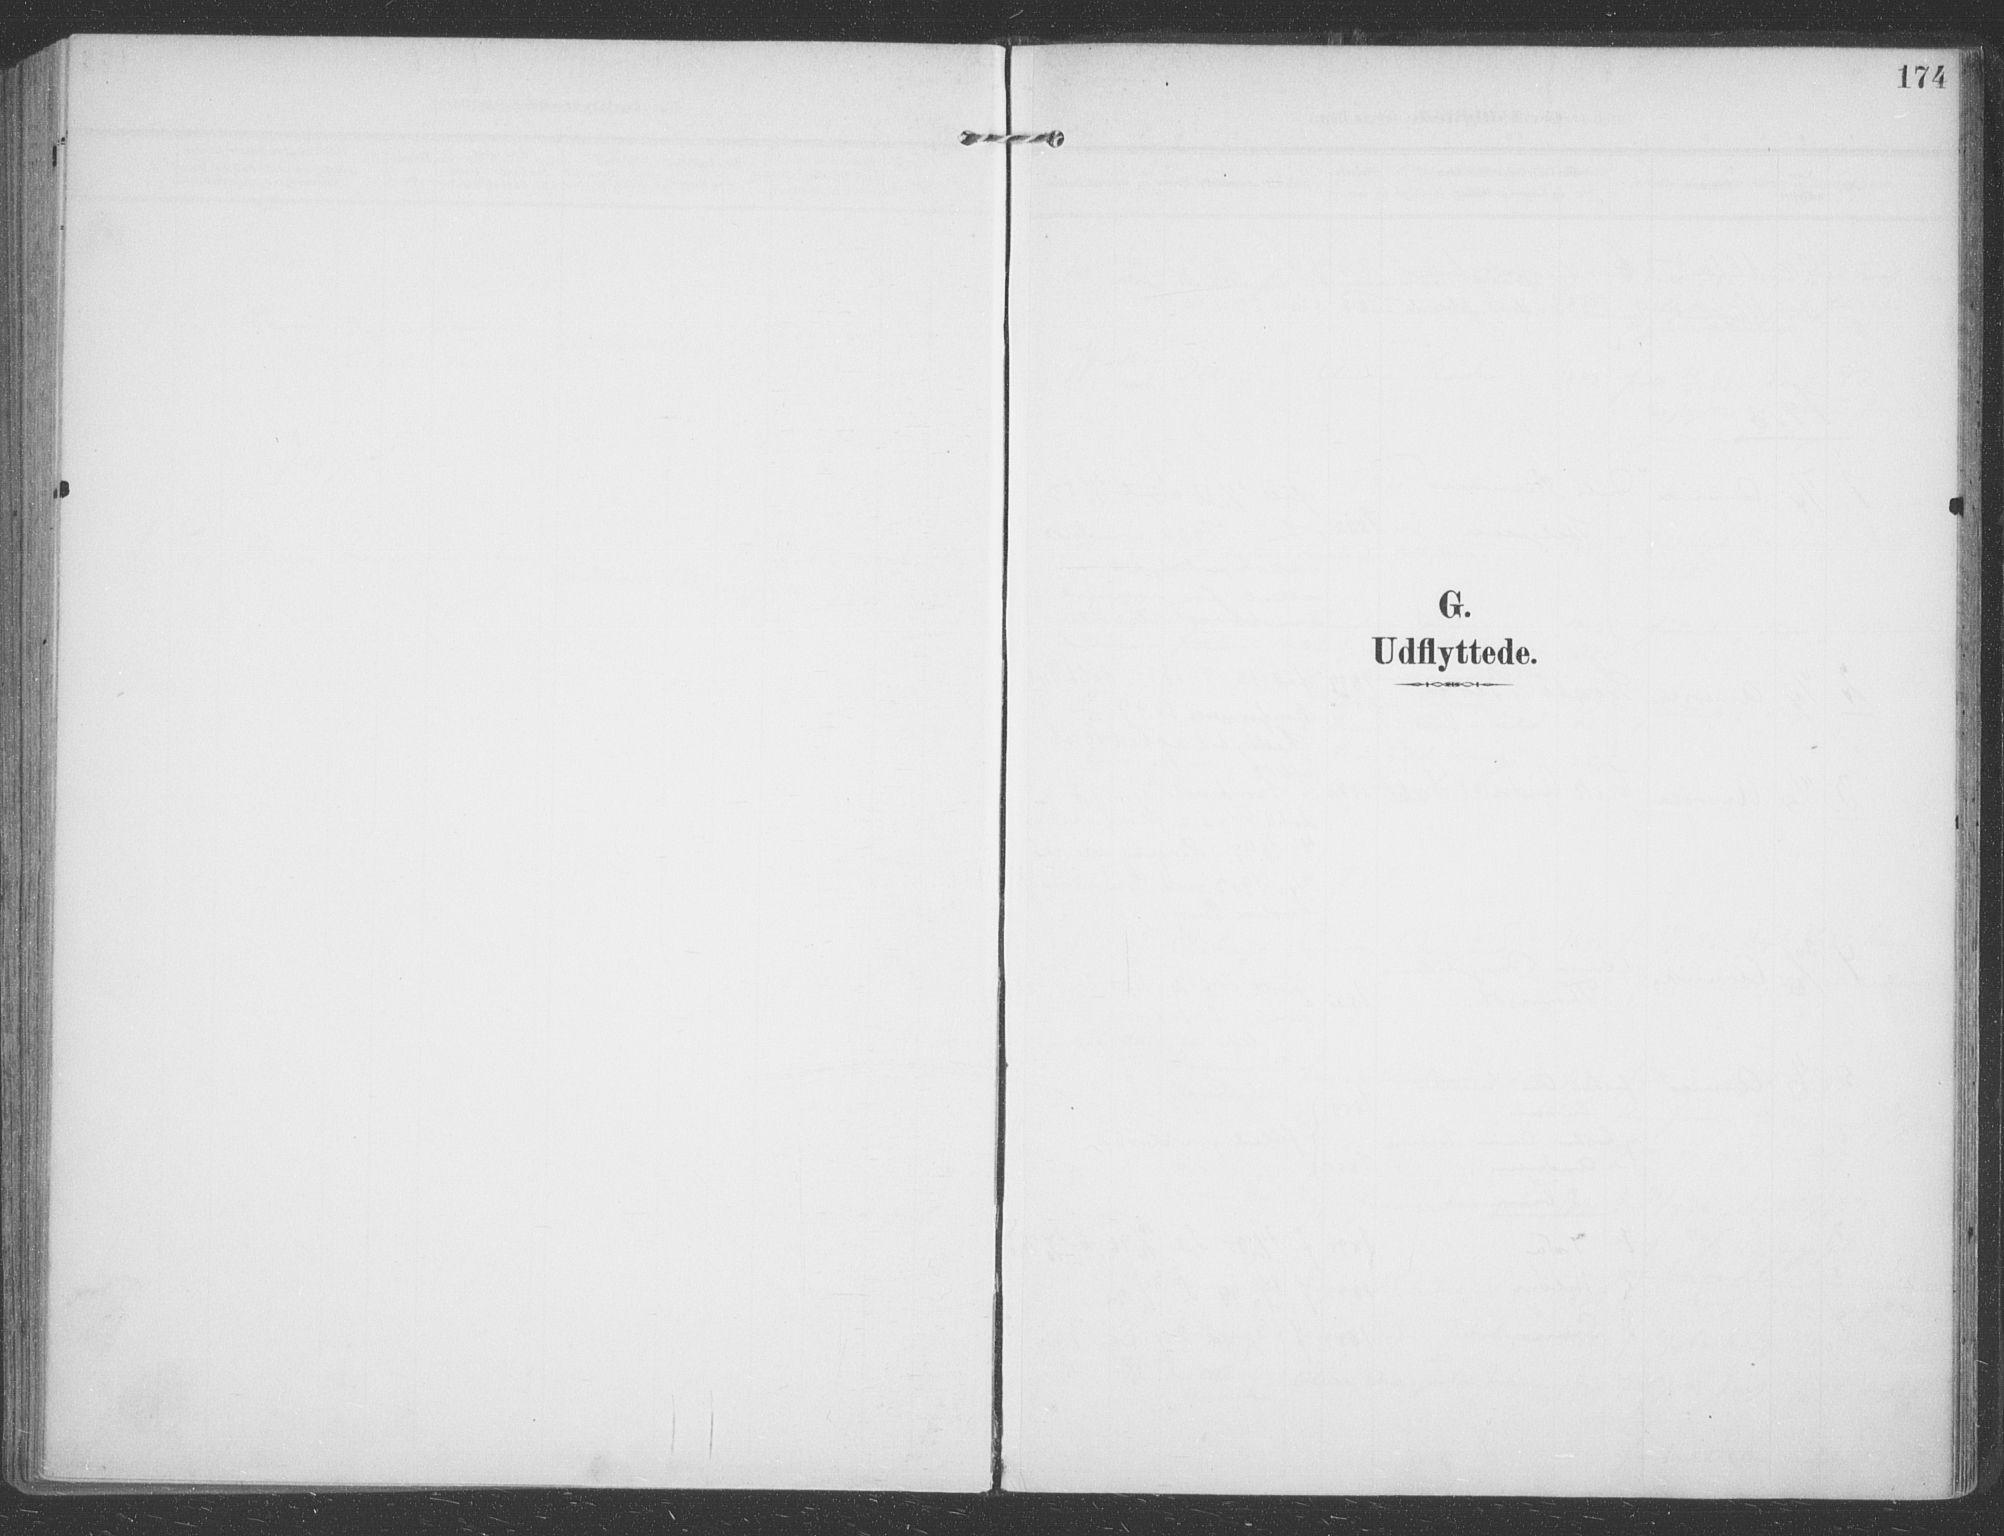 SATØ, Talvik sokneprestkontor, H/Ha/L0017kirke: Ministerialbok nr. 17, 1906-1915, s. 174